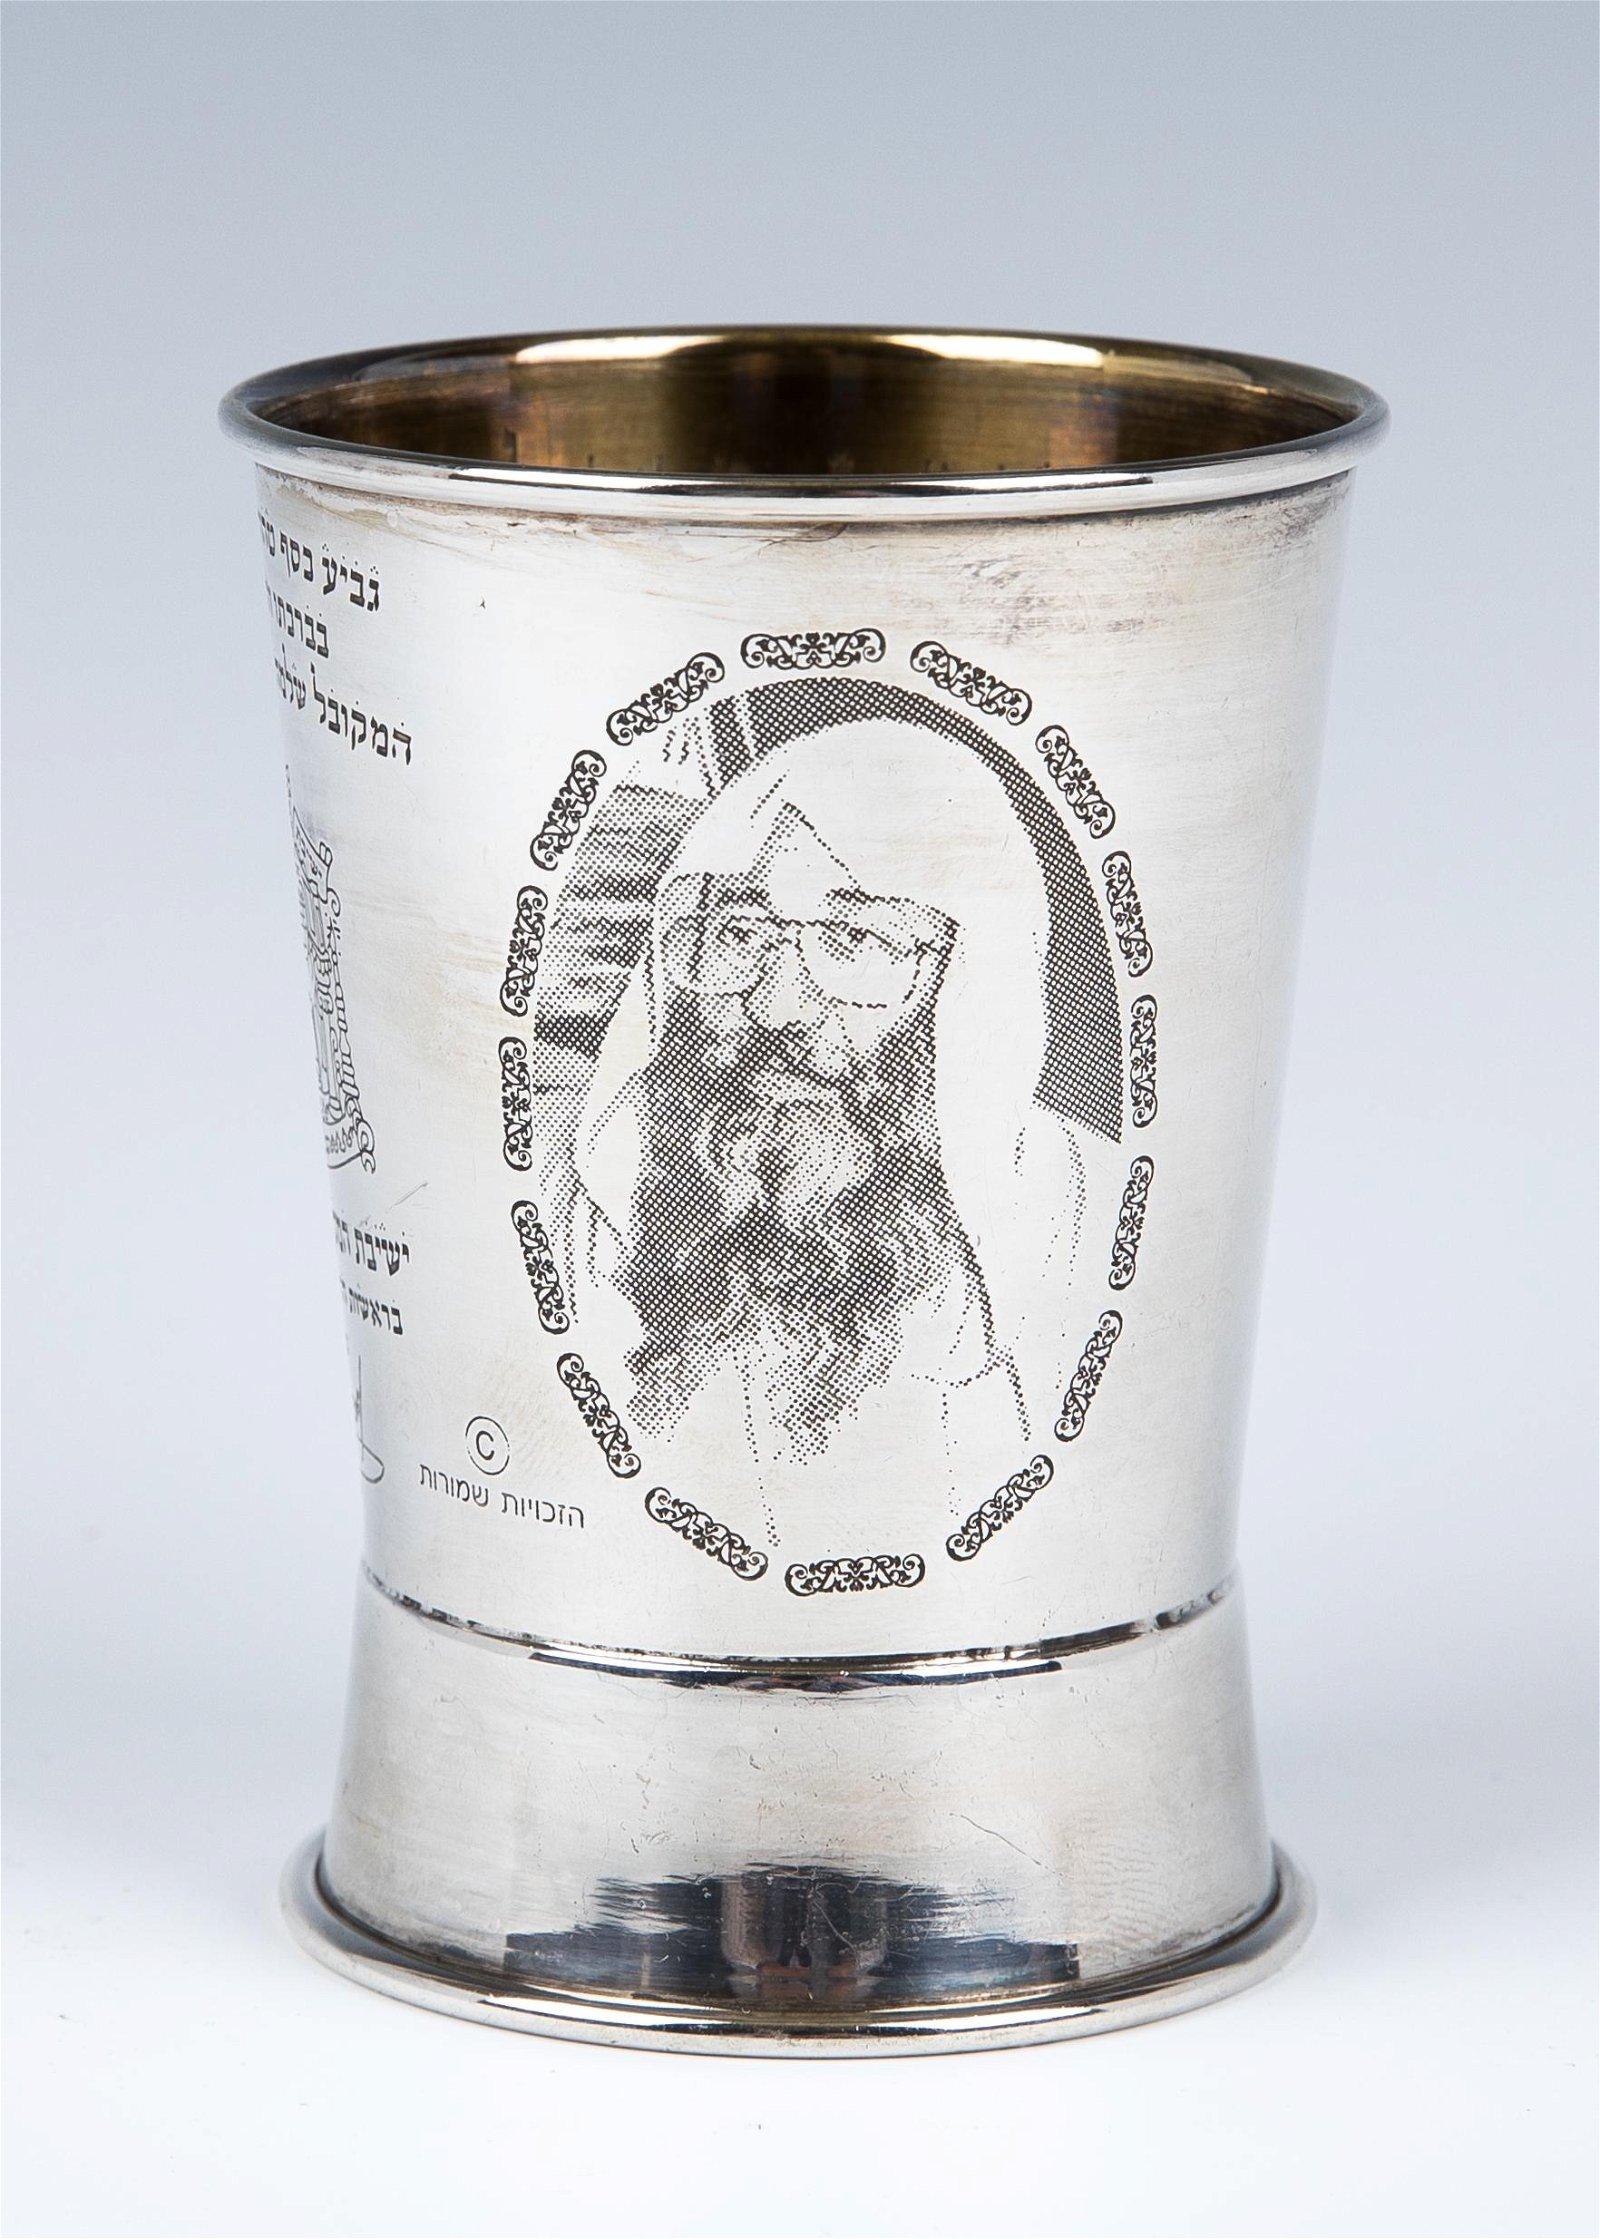 A STERLING SILVER KIDDUSH CUP. Israel, c. 1990.